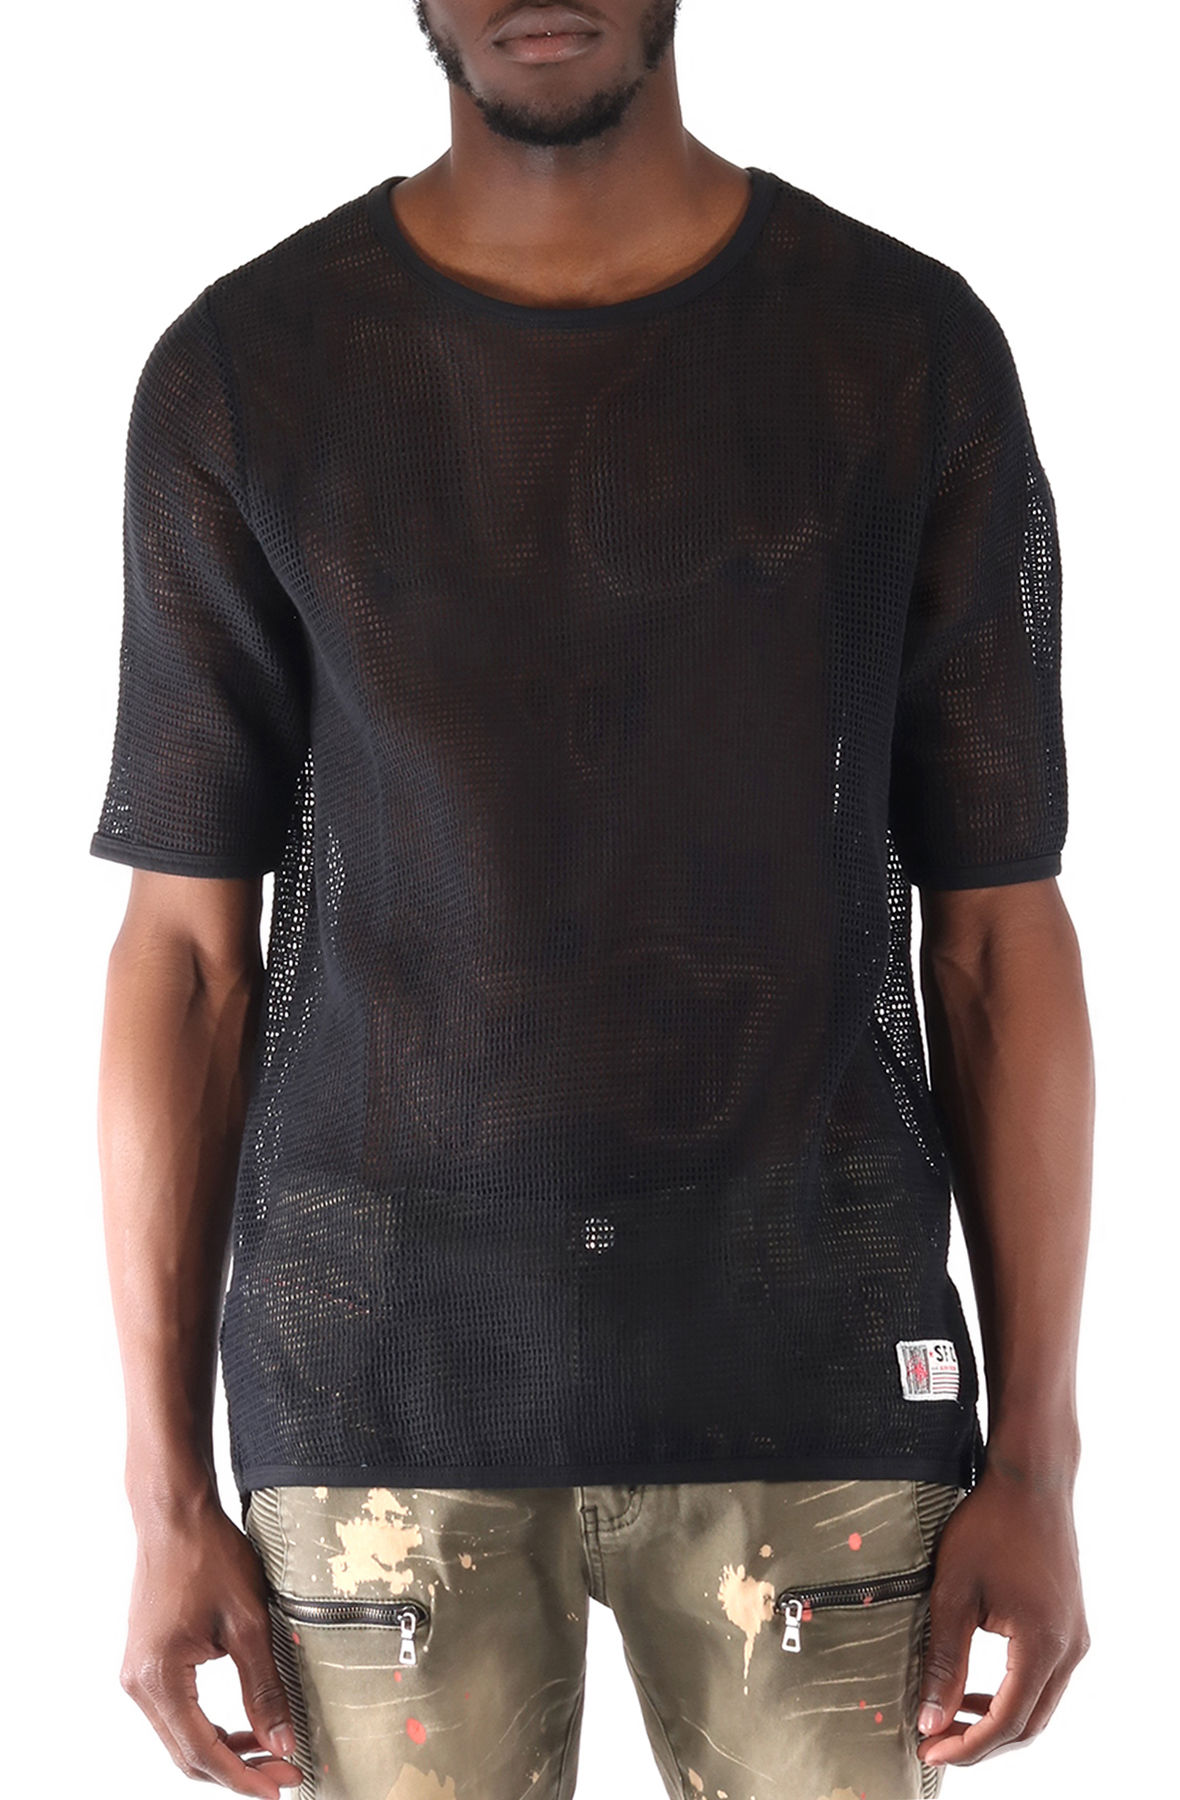 Image of SquareZero Premium Cotton Mesh T-shirt With Finely Finished Edge In Black